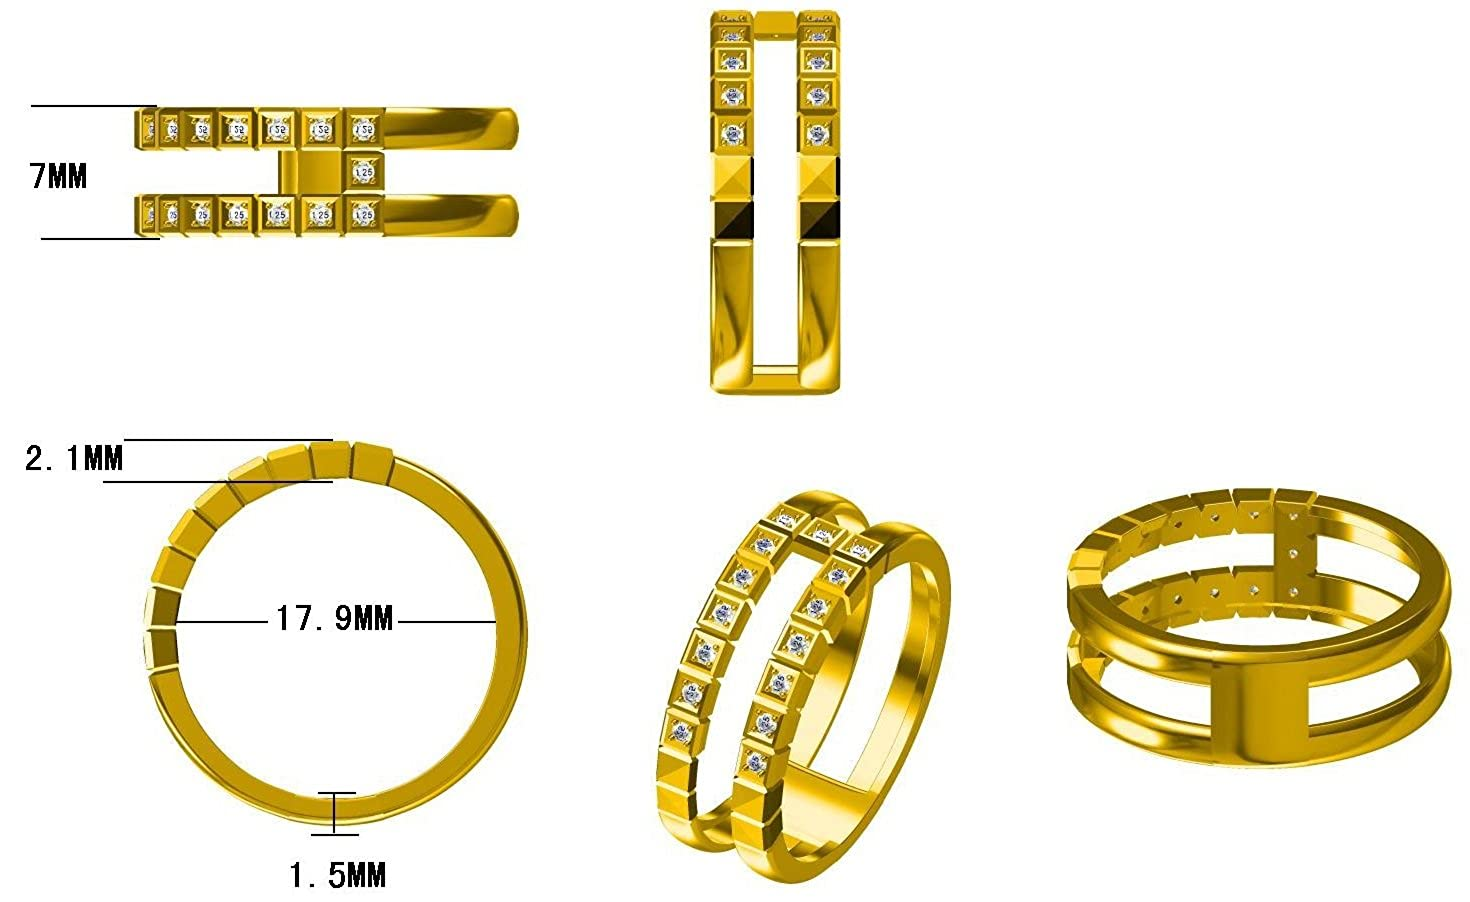 Prism Jewel 0.13CT G-H//SI1 Natural Diamond Light Weight 2-Row Wedding Band